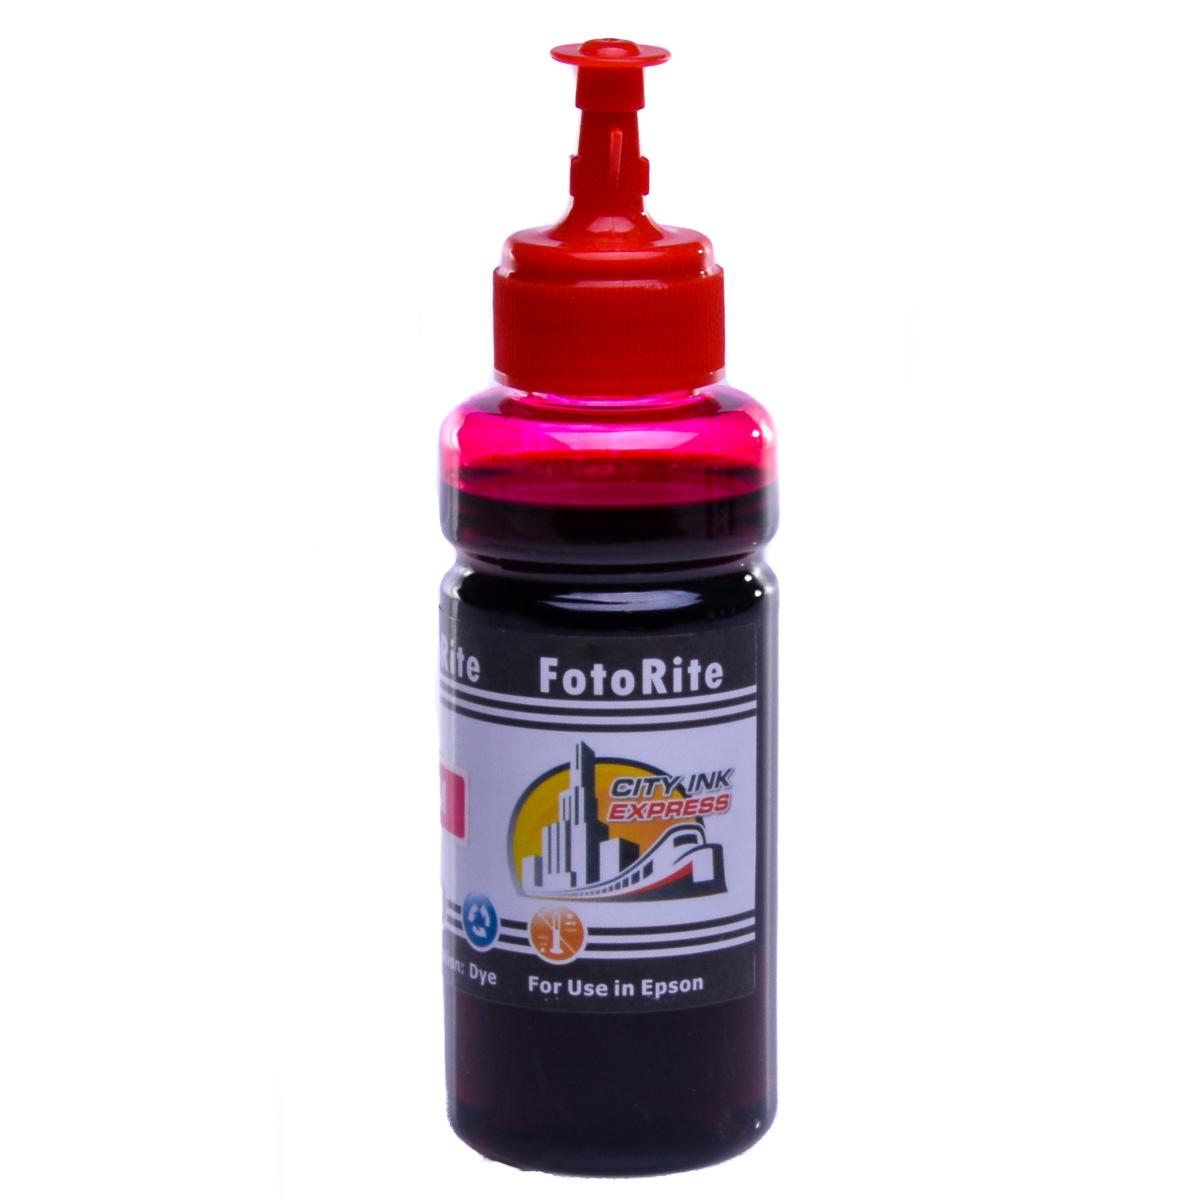 Cheap Magenta dye ink refill replaces Epson XP-432 - T2983